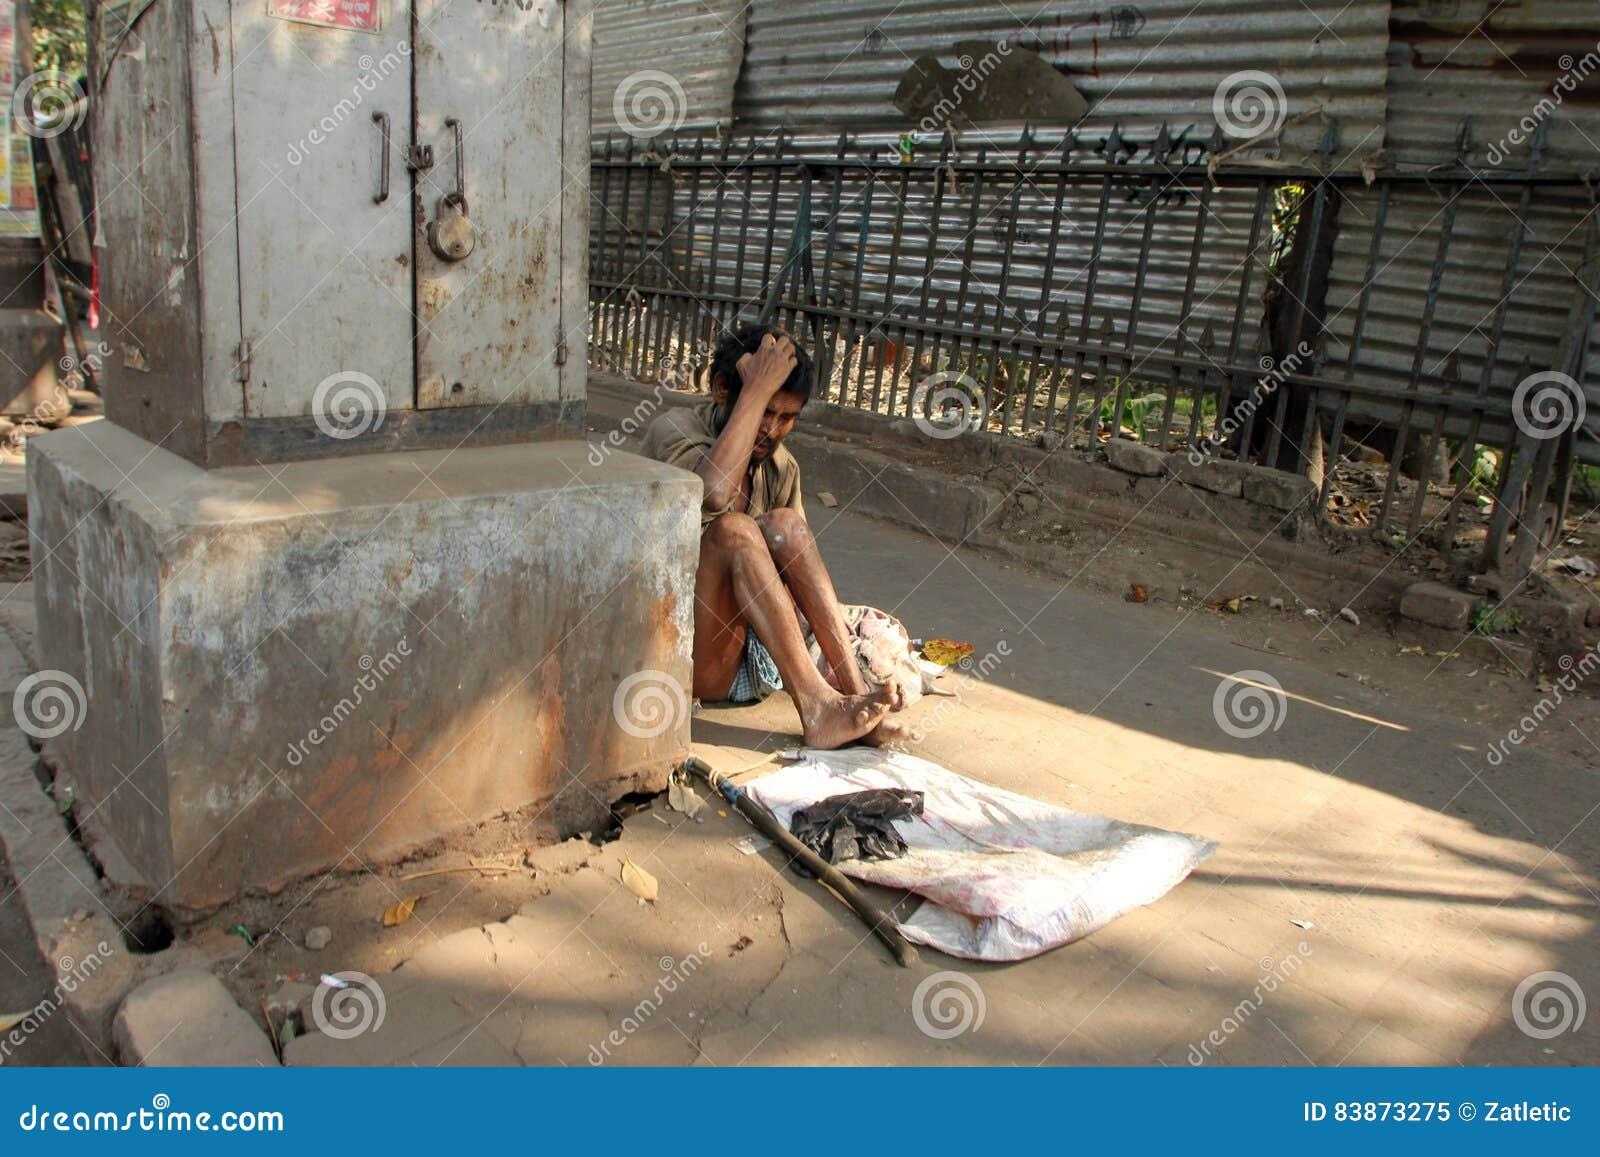 Straten van Kolkata bedelaars